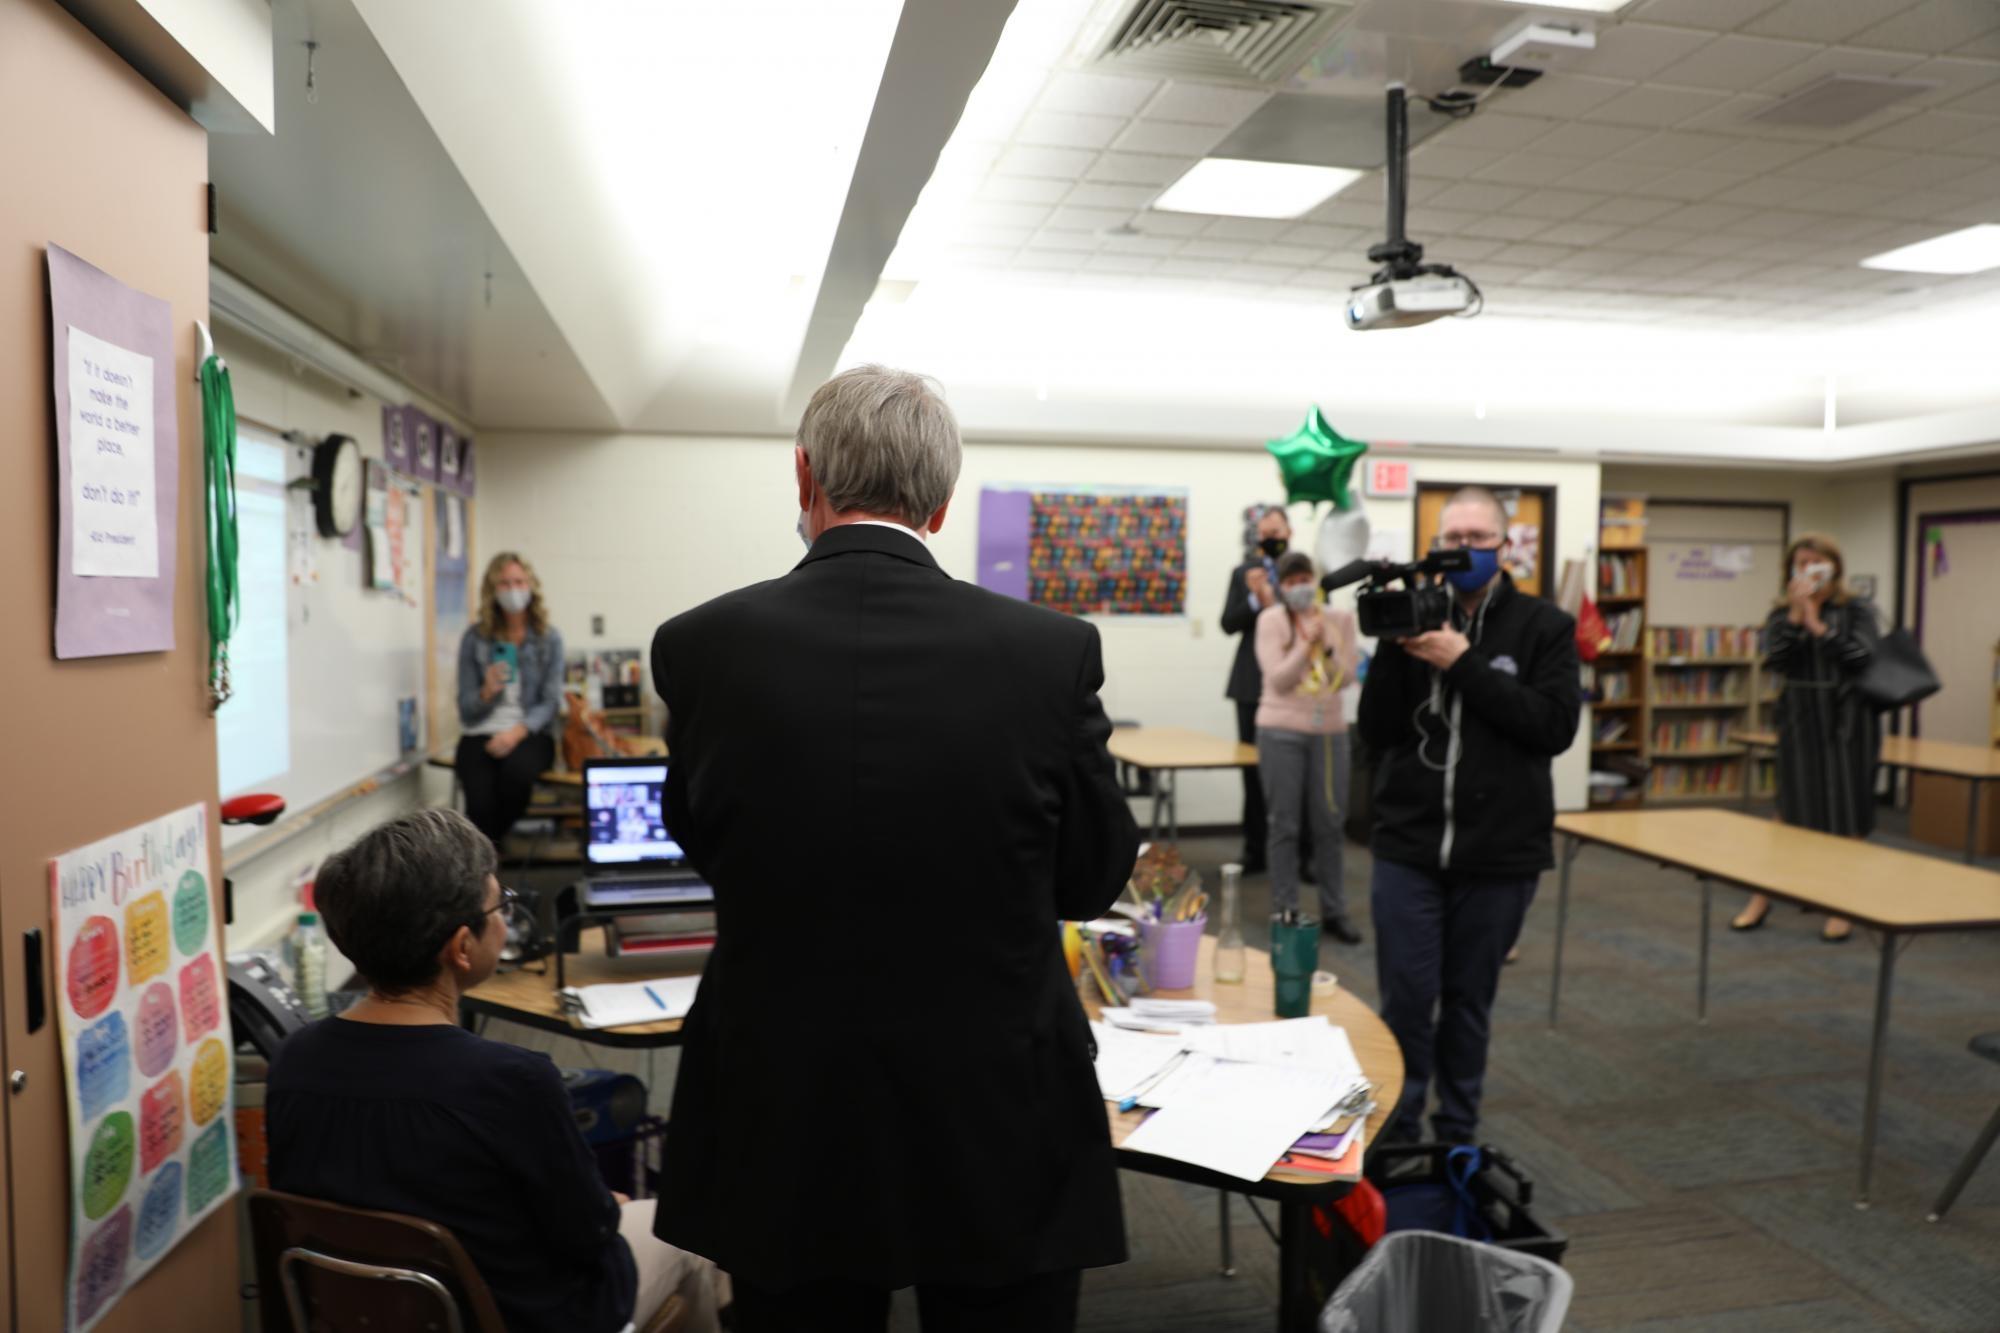 Dr. Thacker surprises Mrs. Shreiner while she's teaching her virtual class